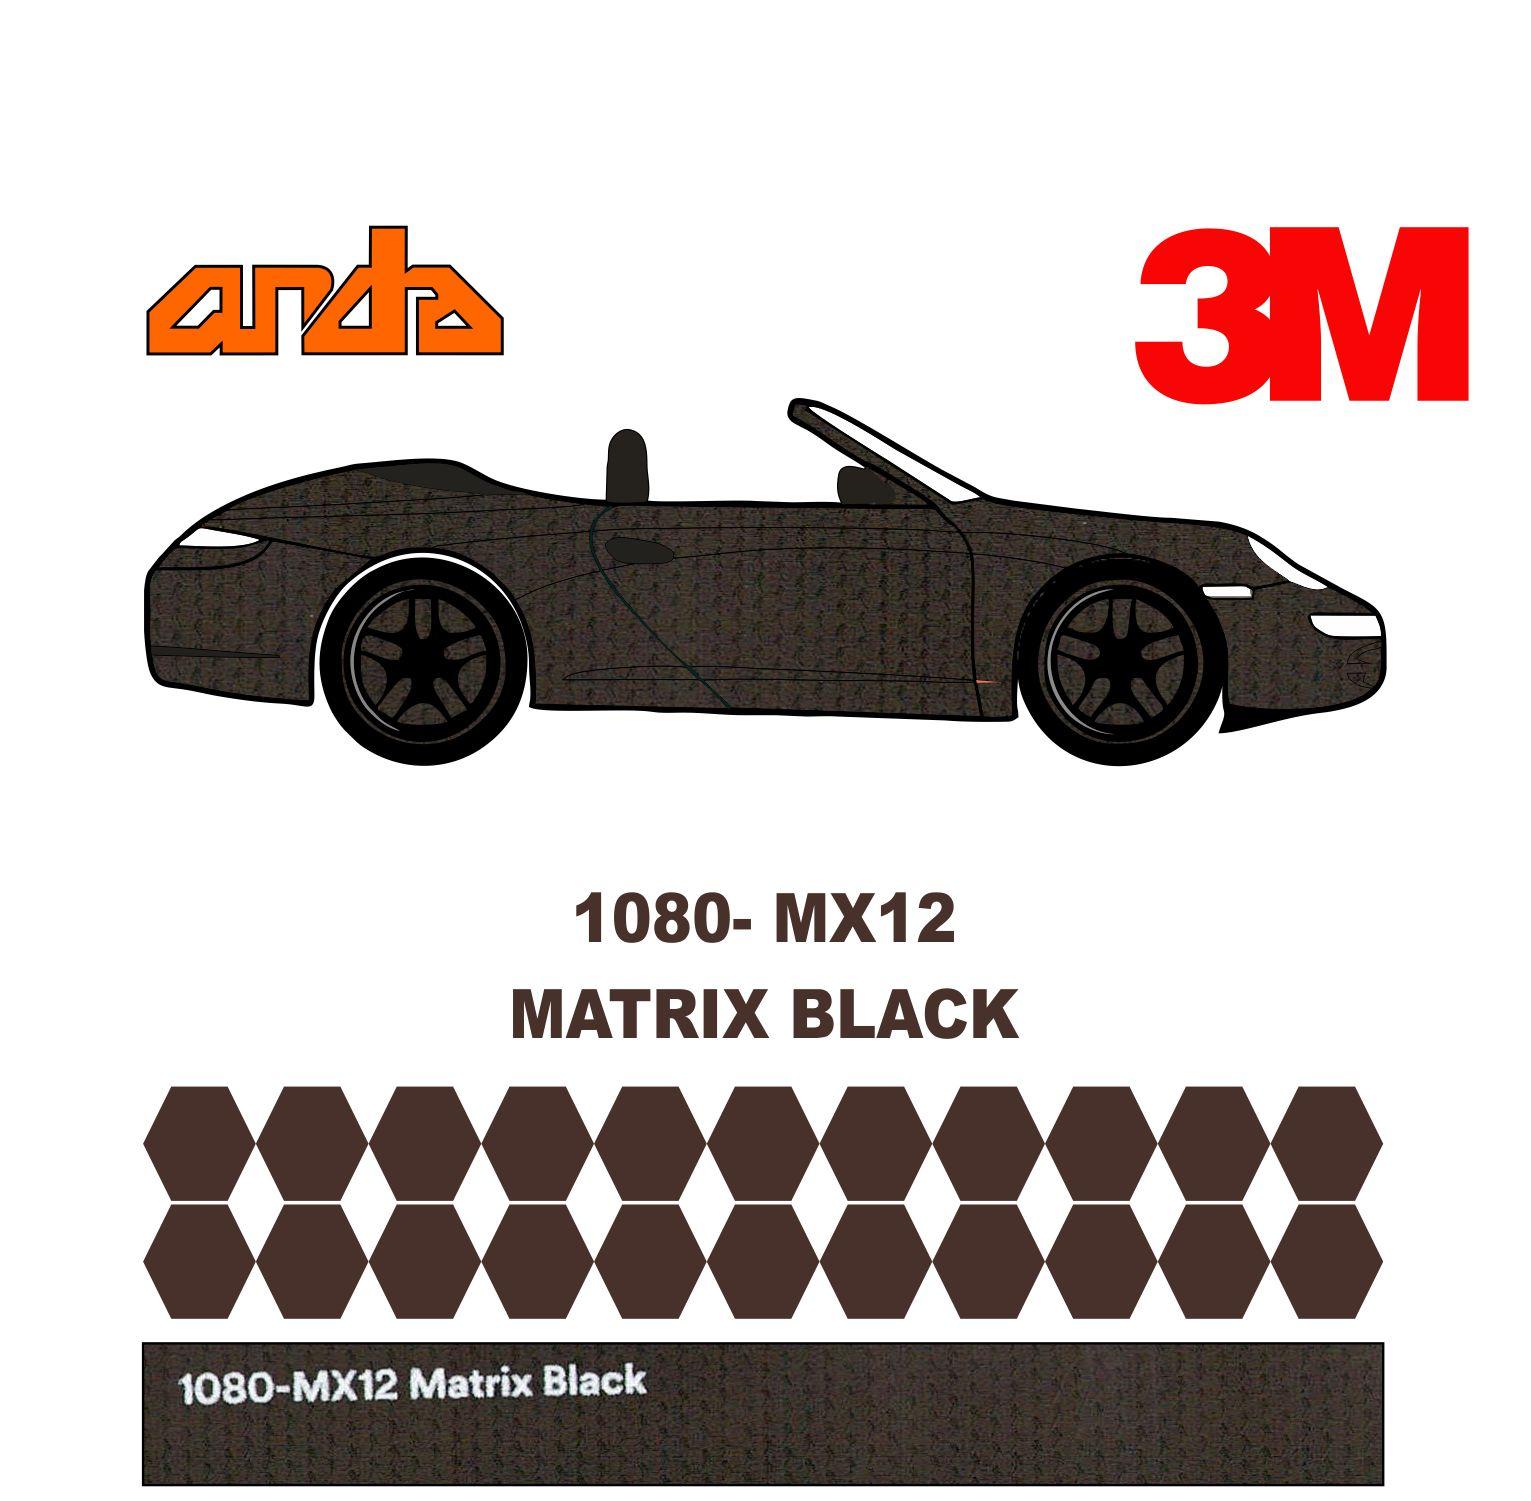 3M 1080-MX12 Matrix Black 1